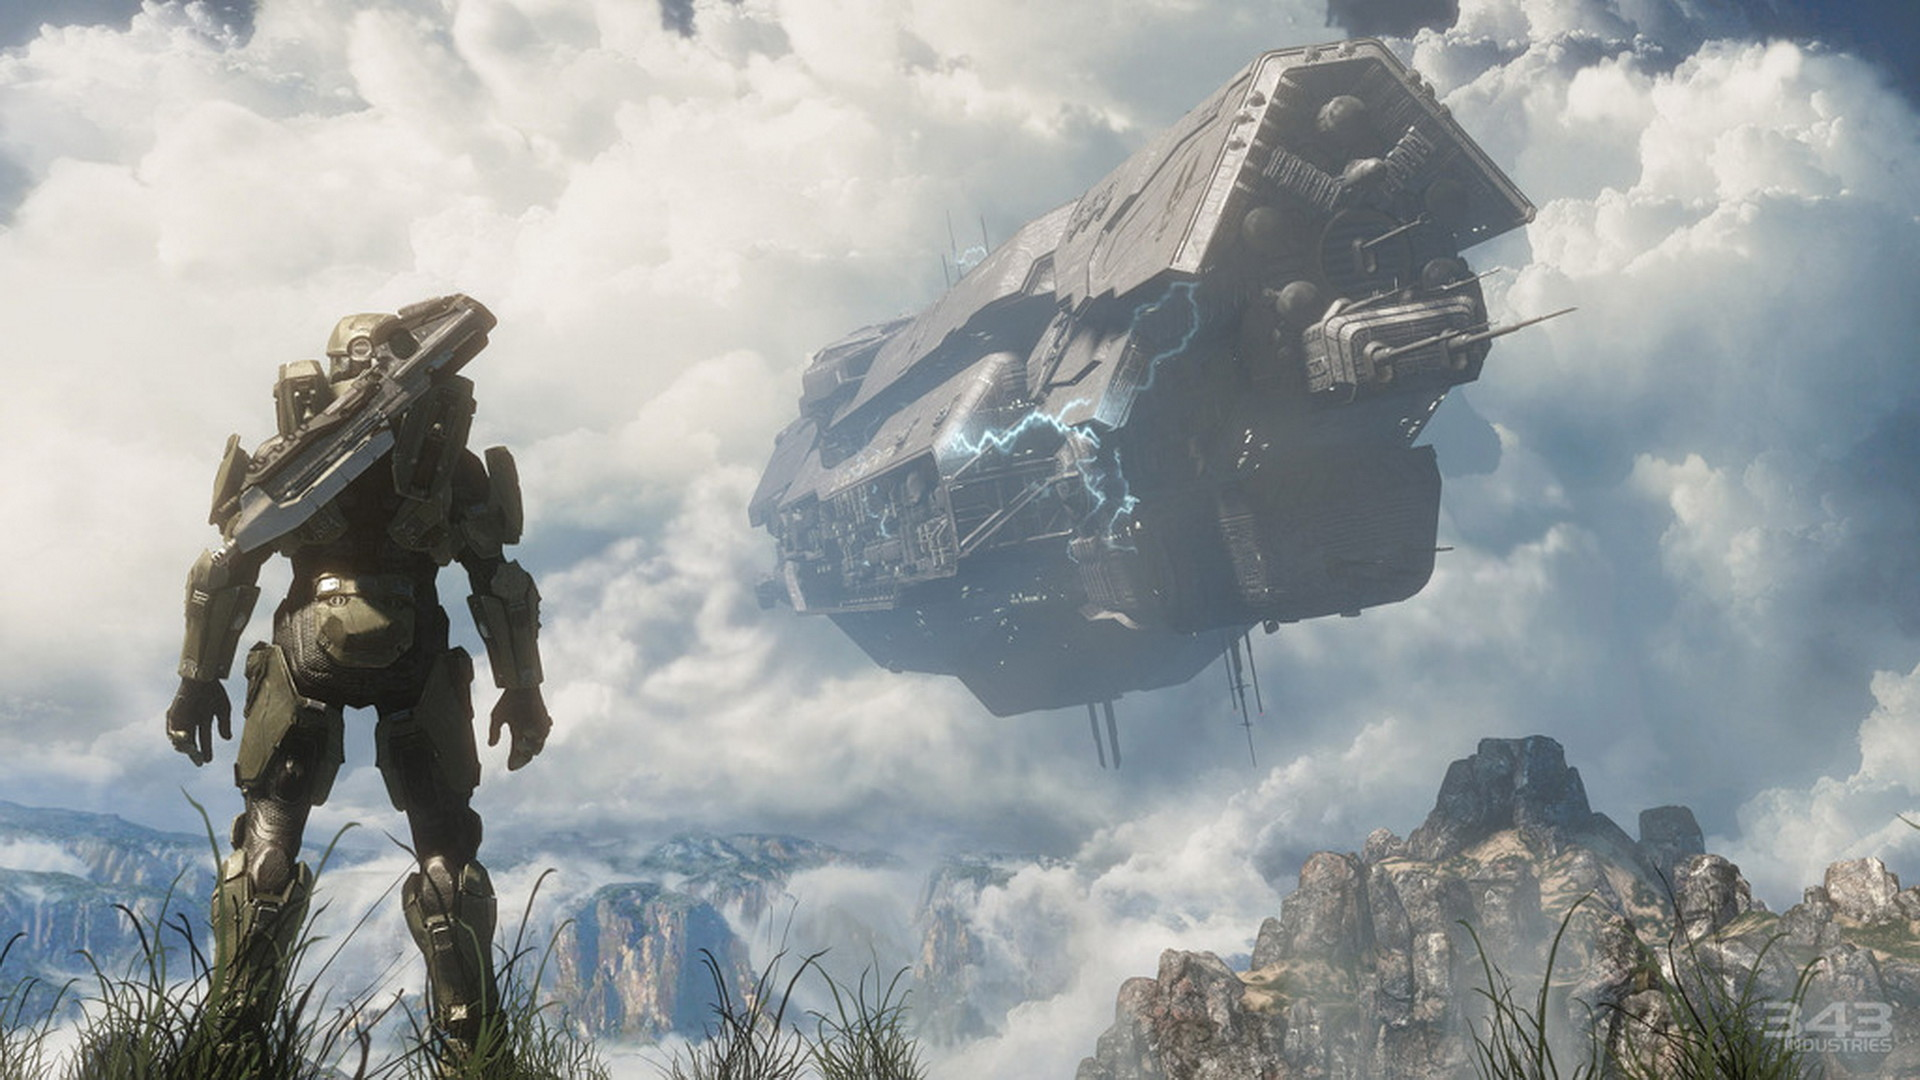 Halo 4 – Master Chief Spartan – UNSC ship crashing